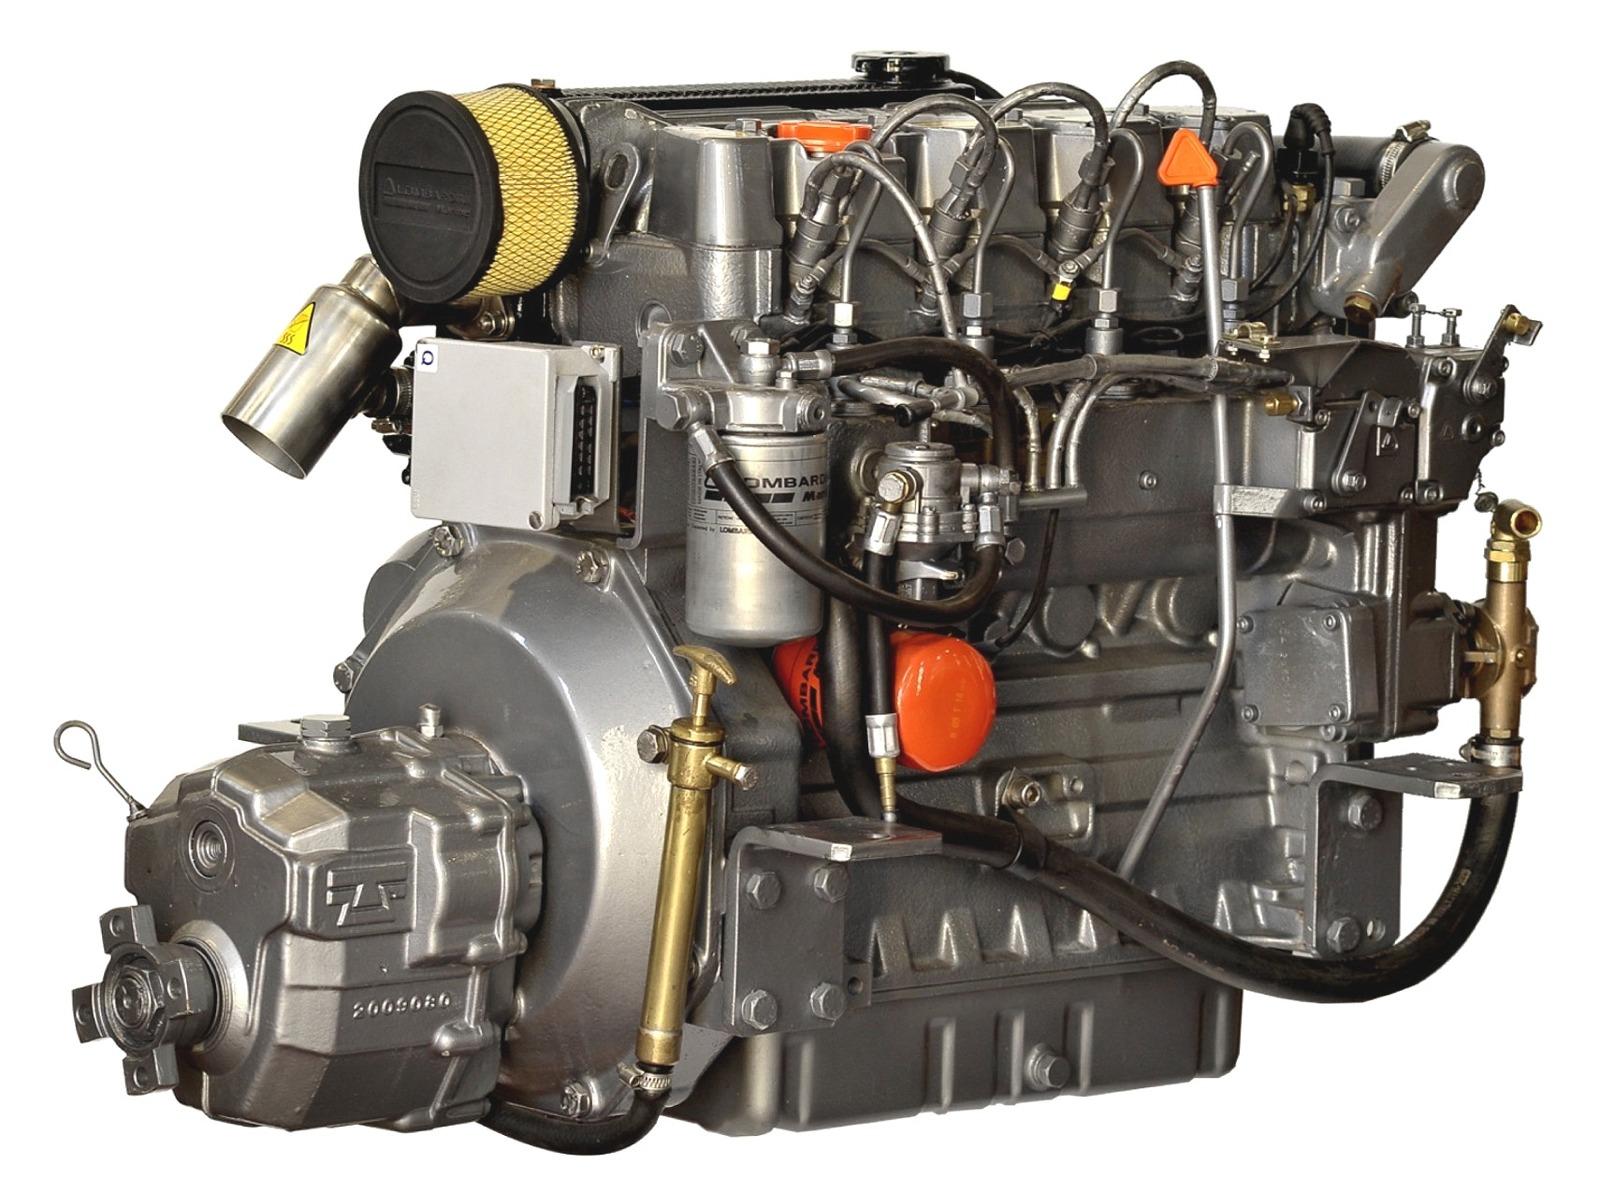 Lombardini LDW2204M, 50 hk dieselmotor med backslag TMC60